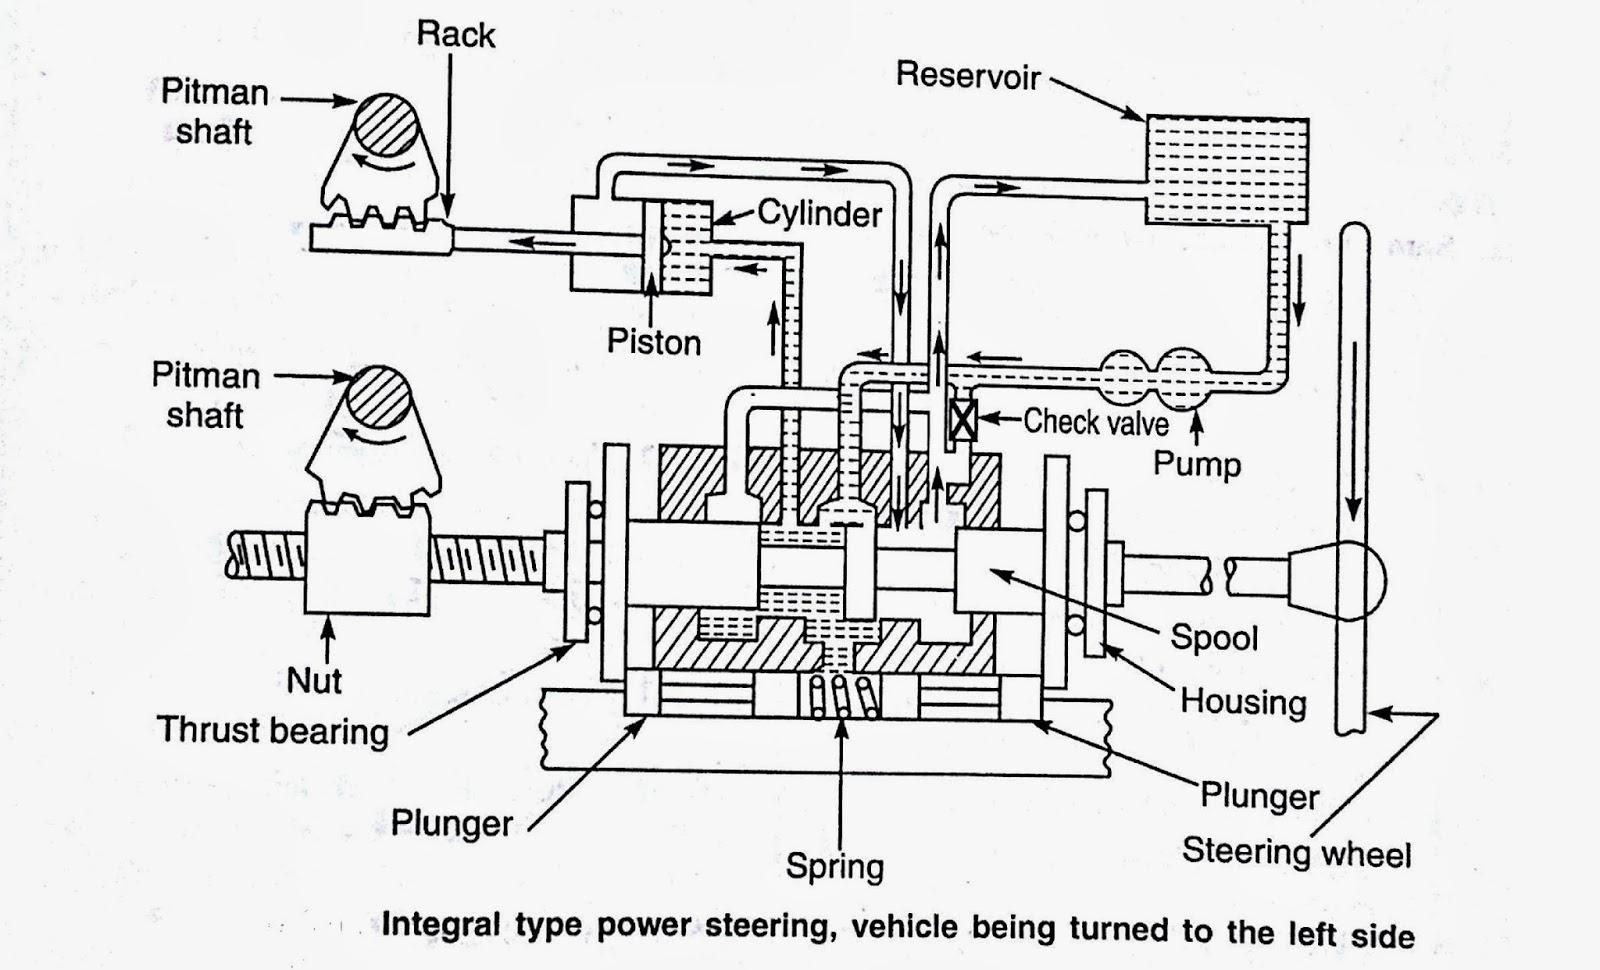 1966 chevy ii nova wiring diagram